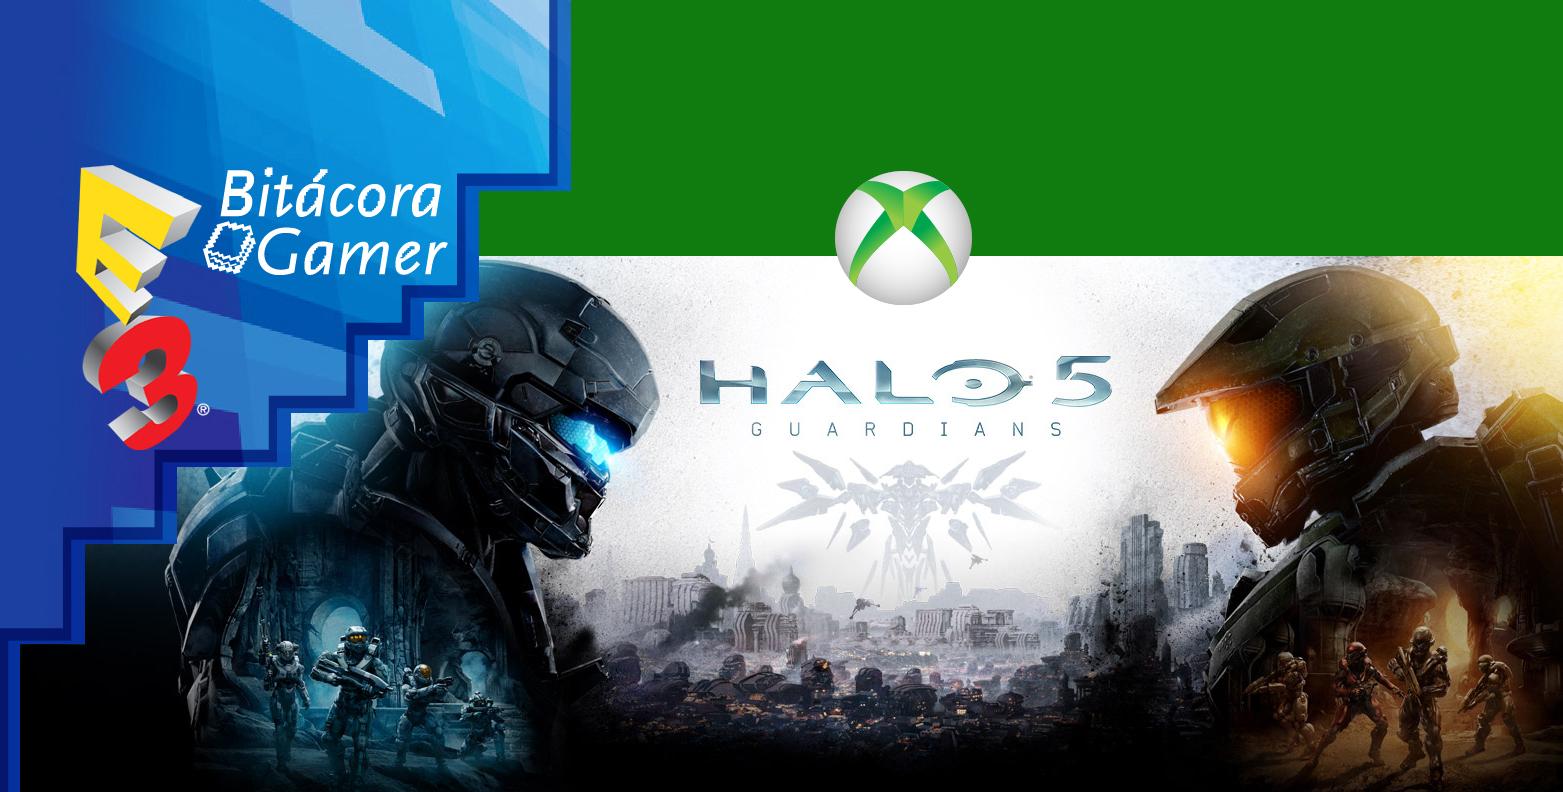 E3 2015 Xbox